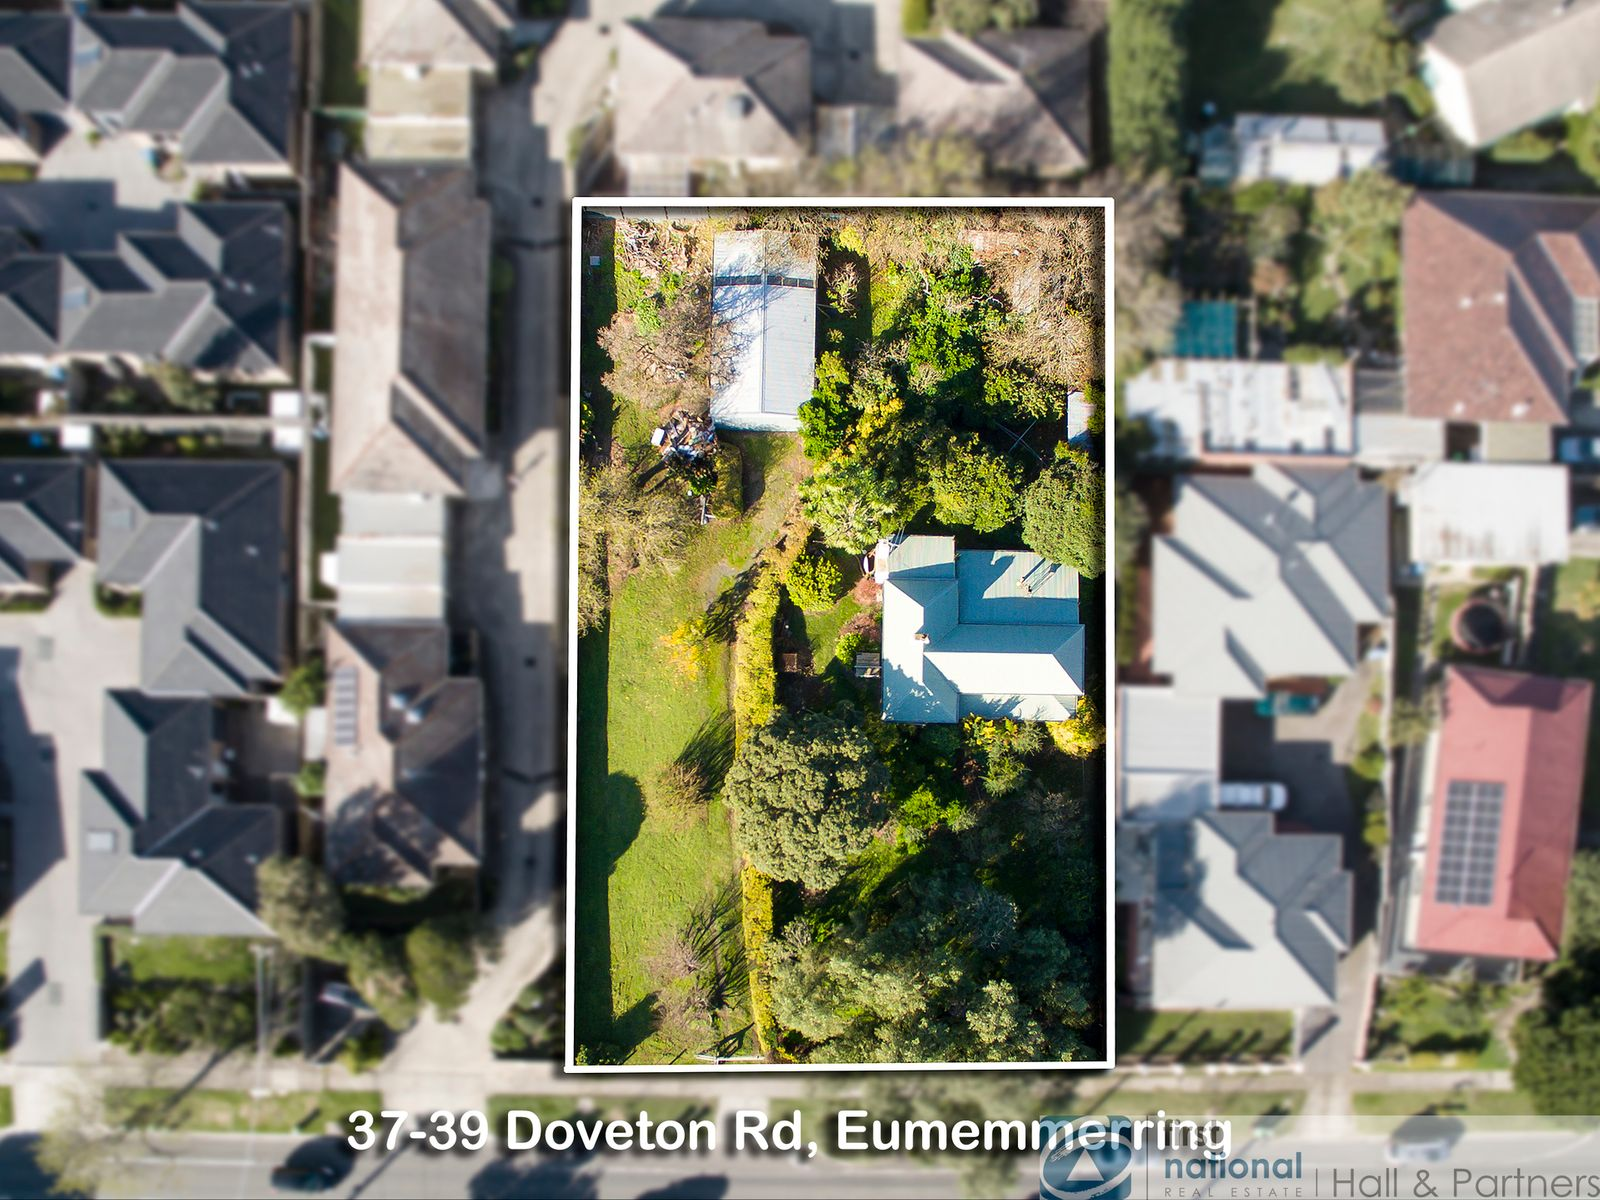 37-39 Doveton Avenue, Eumemmerring, VIC 3177